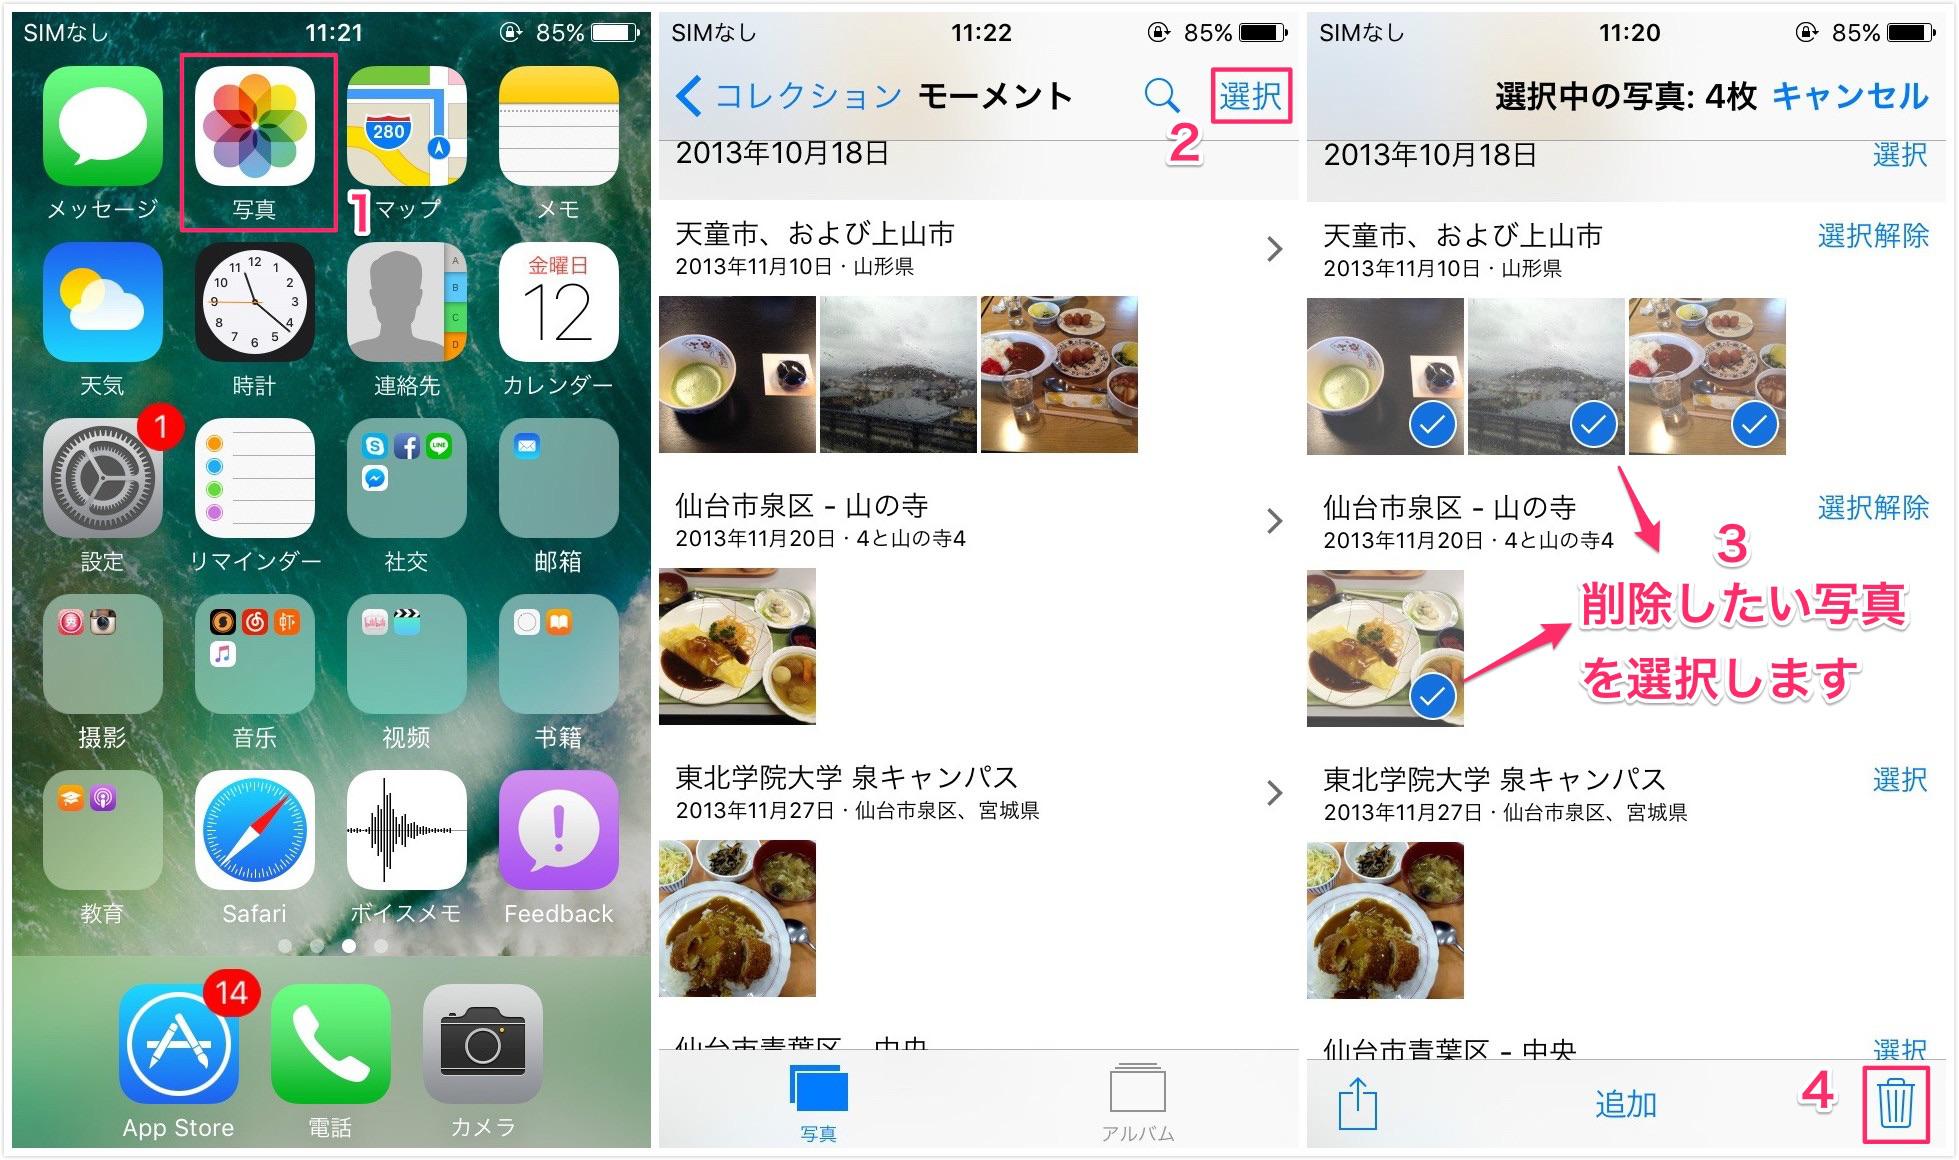 iOS 10アップデート前後の容量不足を解消する方法